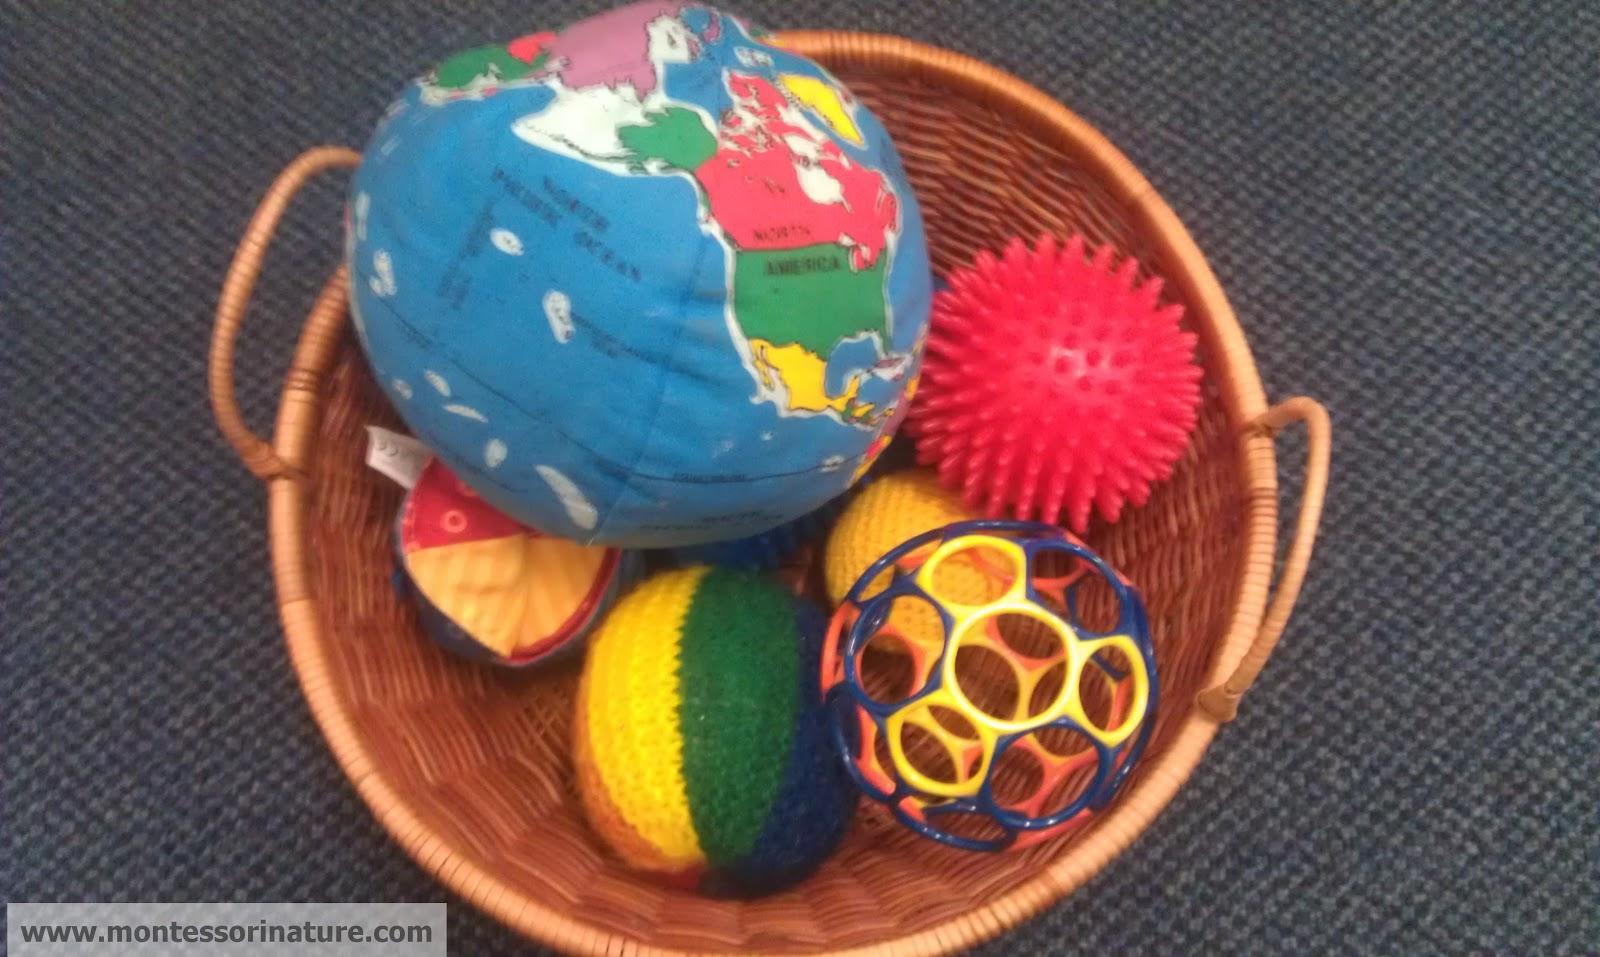 Montessori Inspired Ideas For Infant Toddler Playgroup Montessori